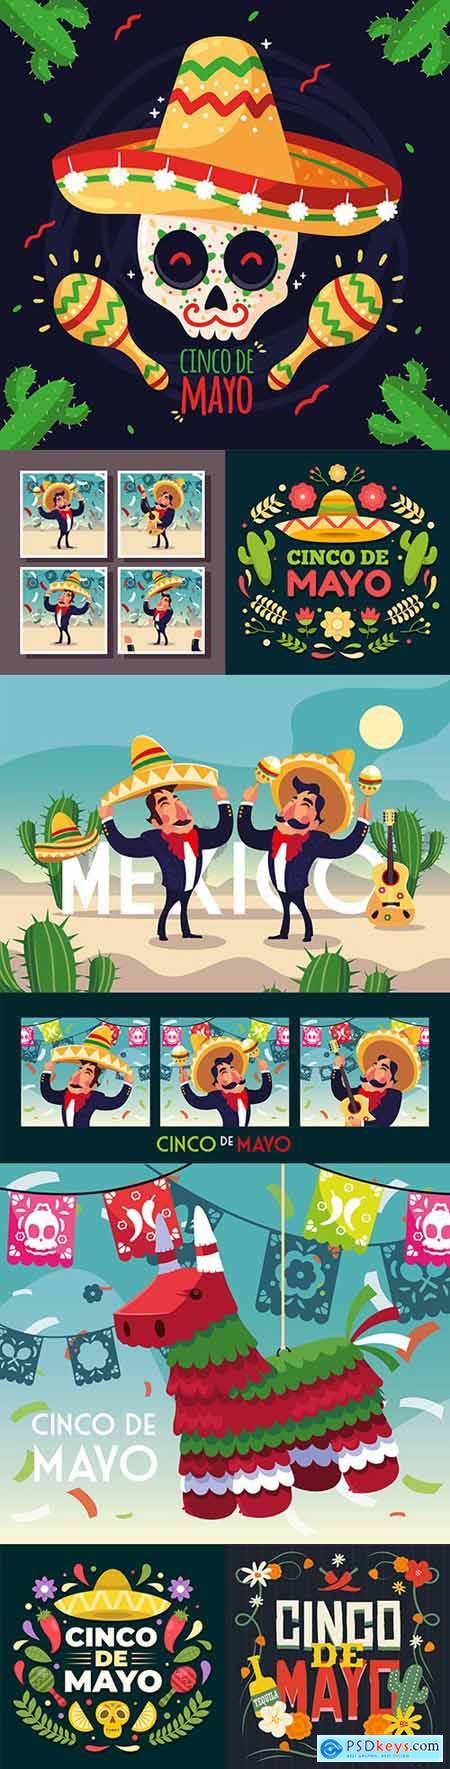 Synco de Mayo Mexican holiday premium illustration 4